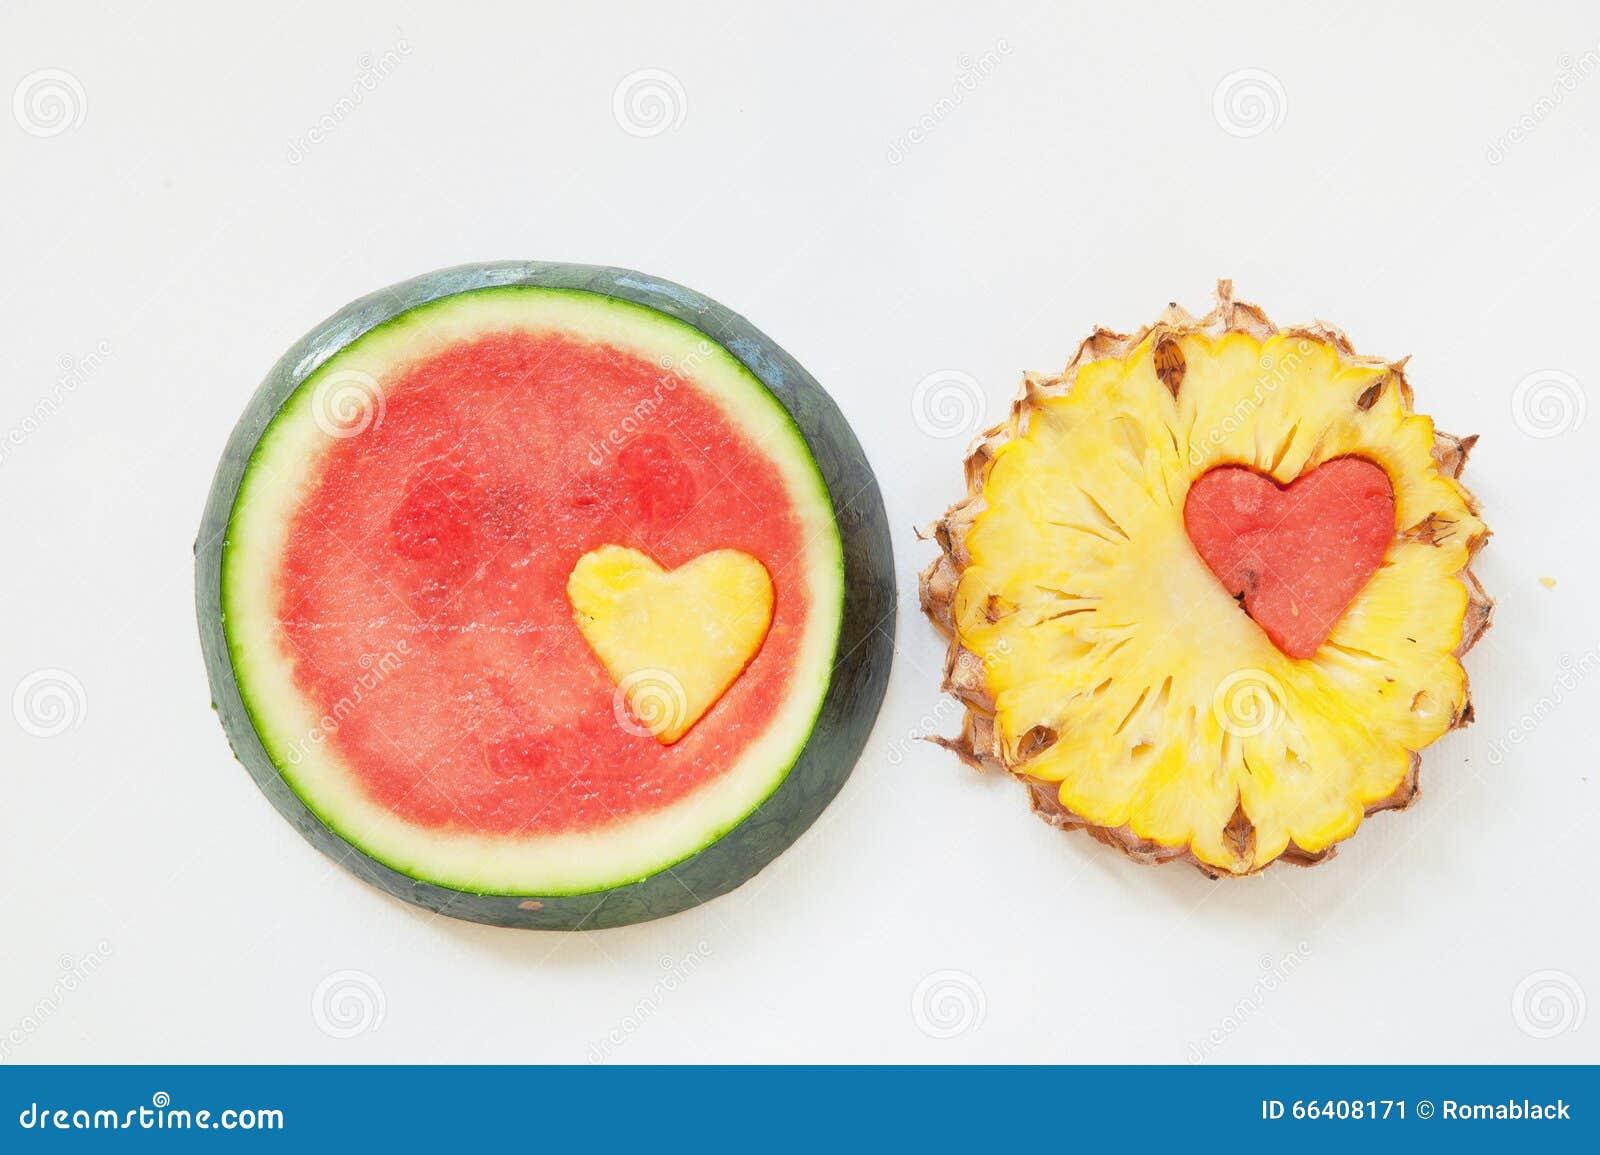 Pineapple watermelon